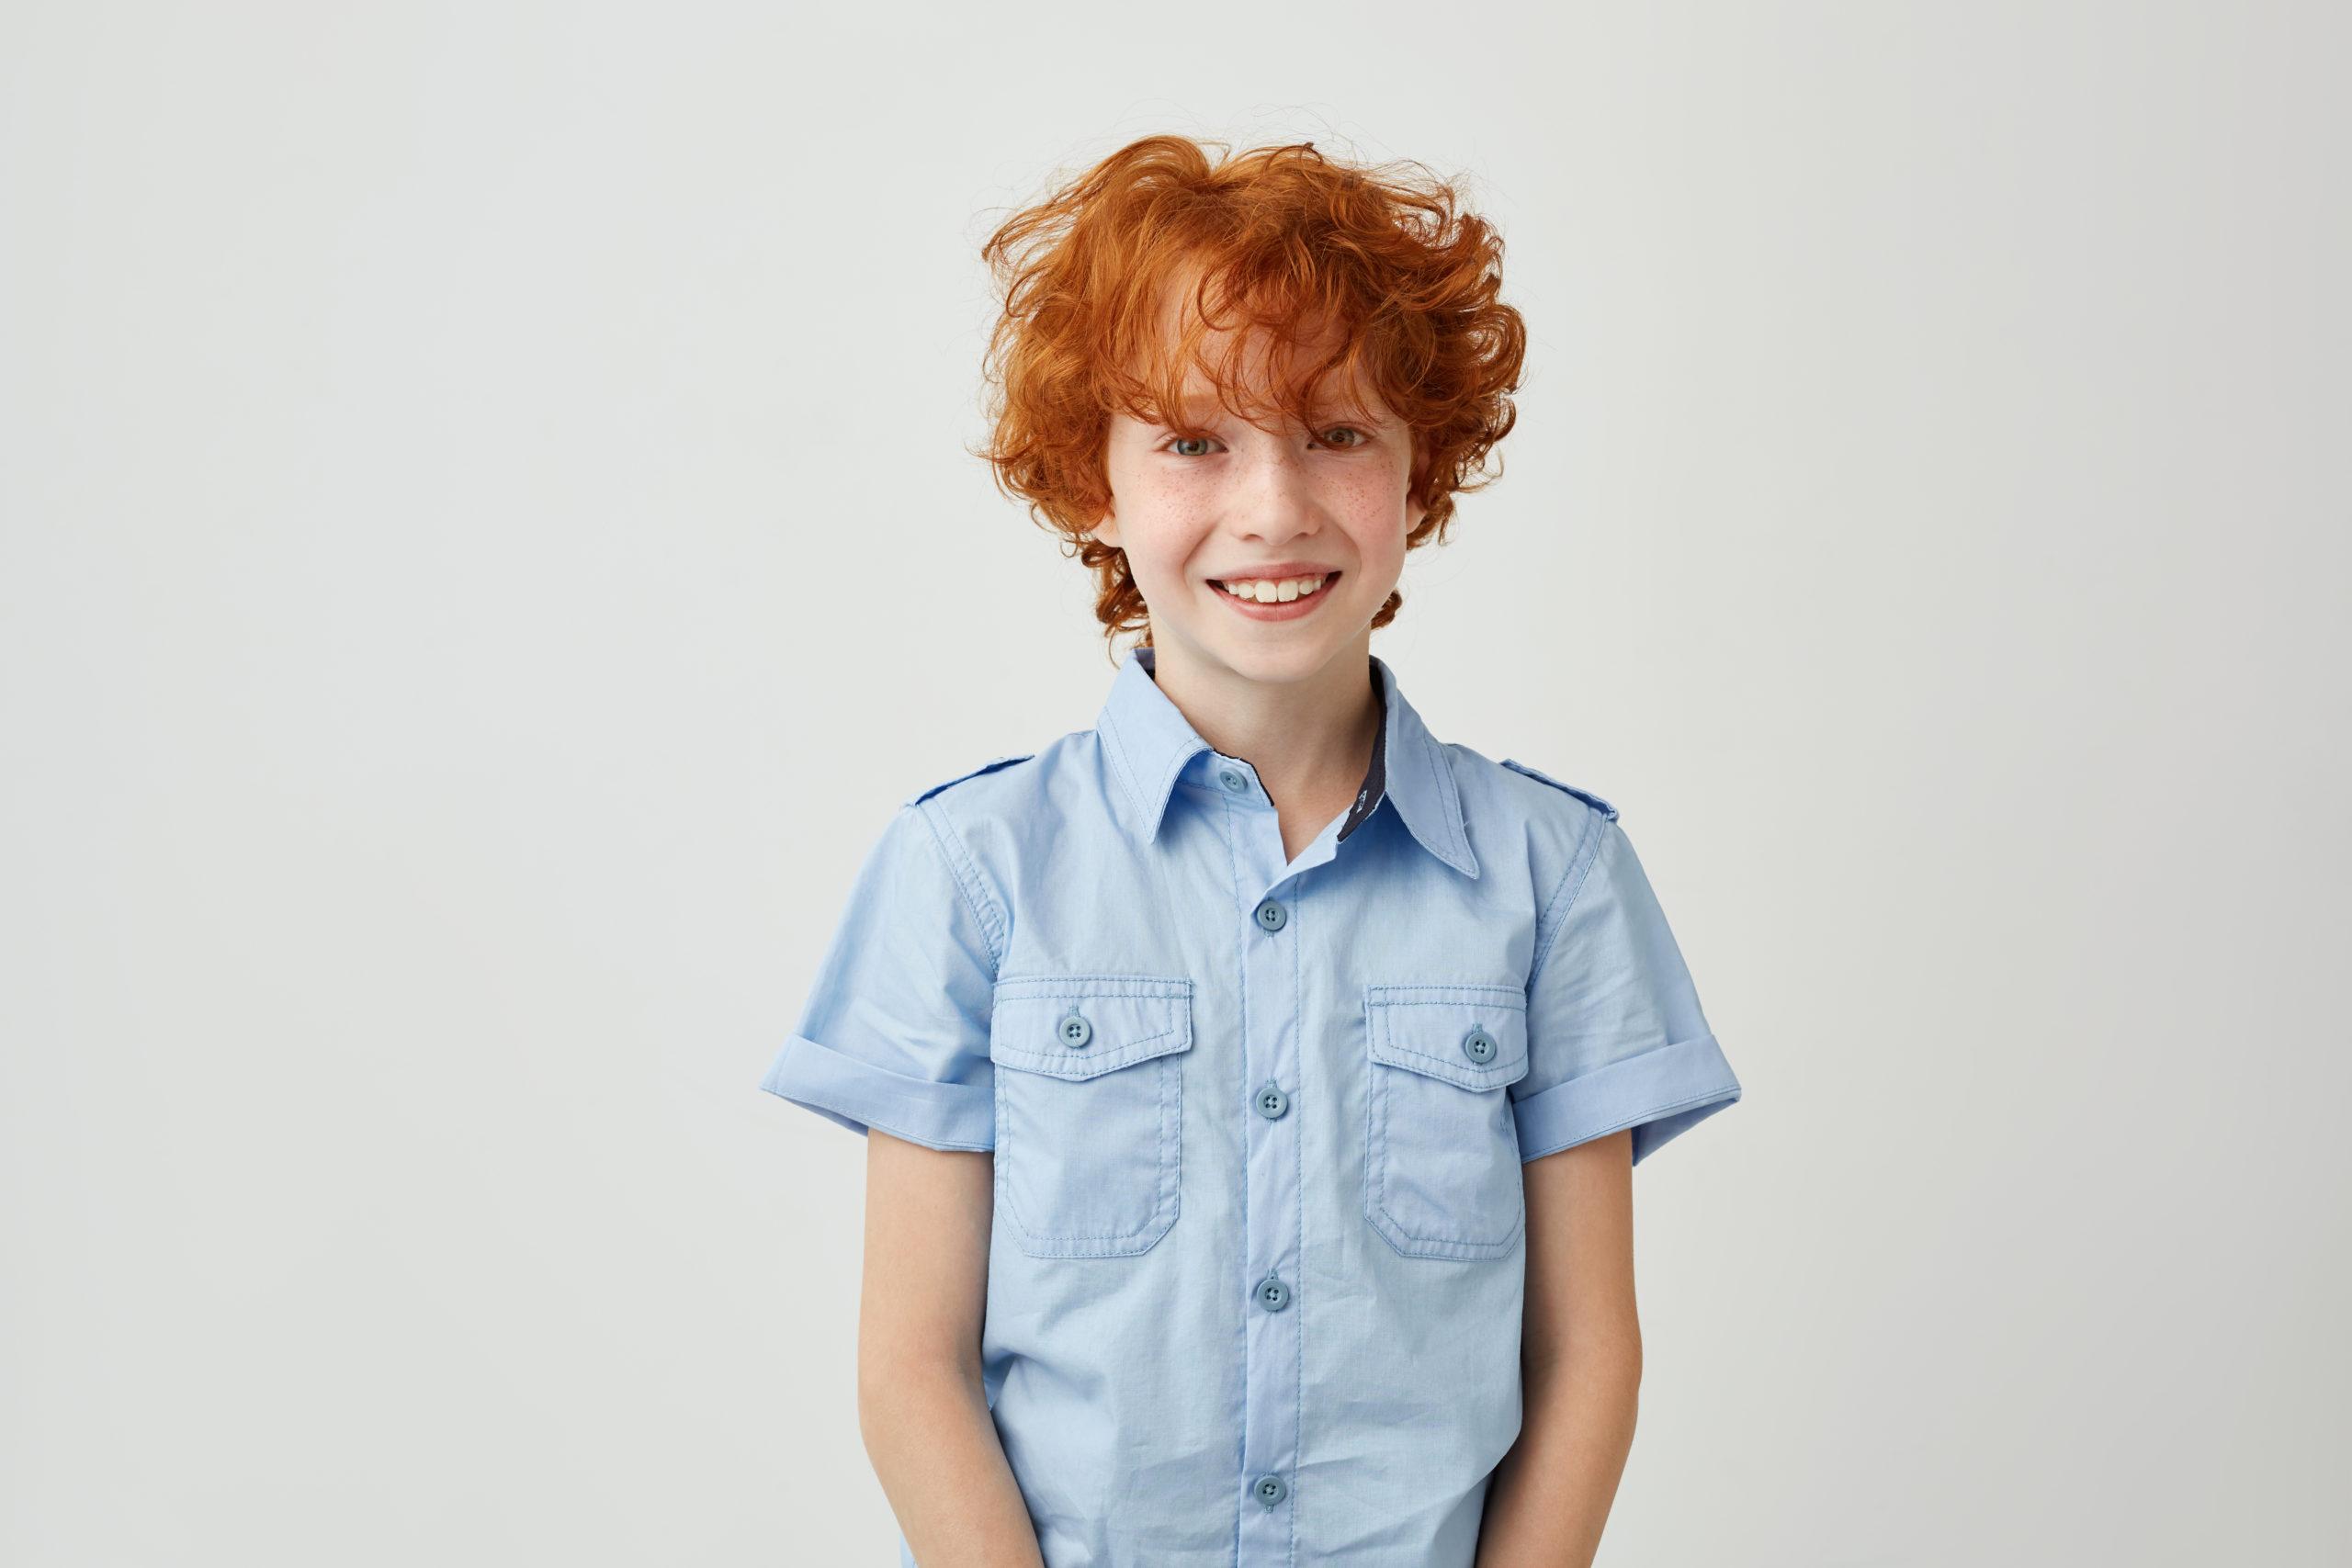 Casting Call – redheaded kids!